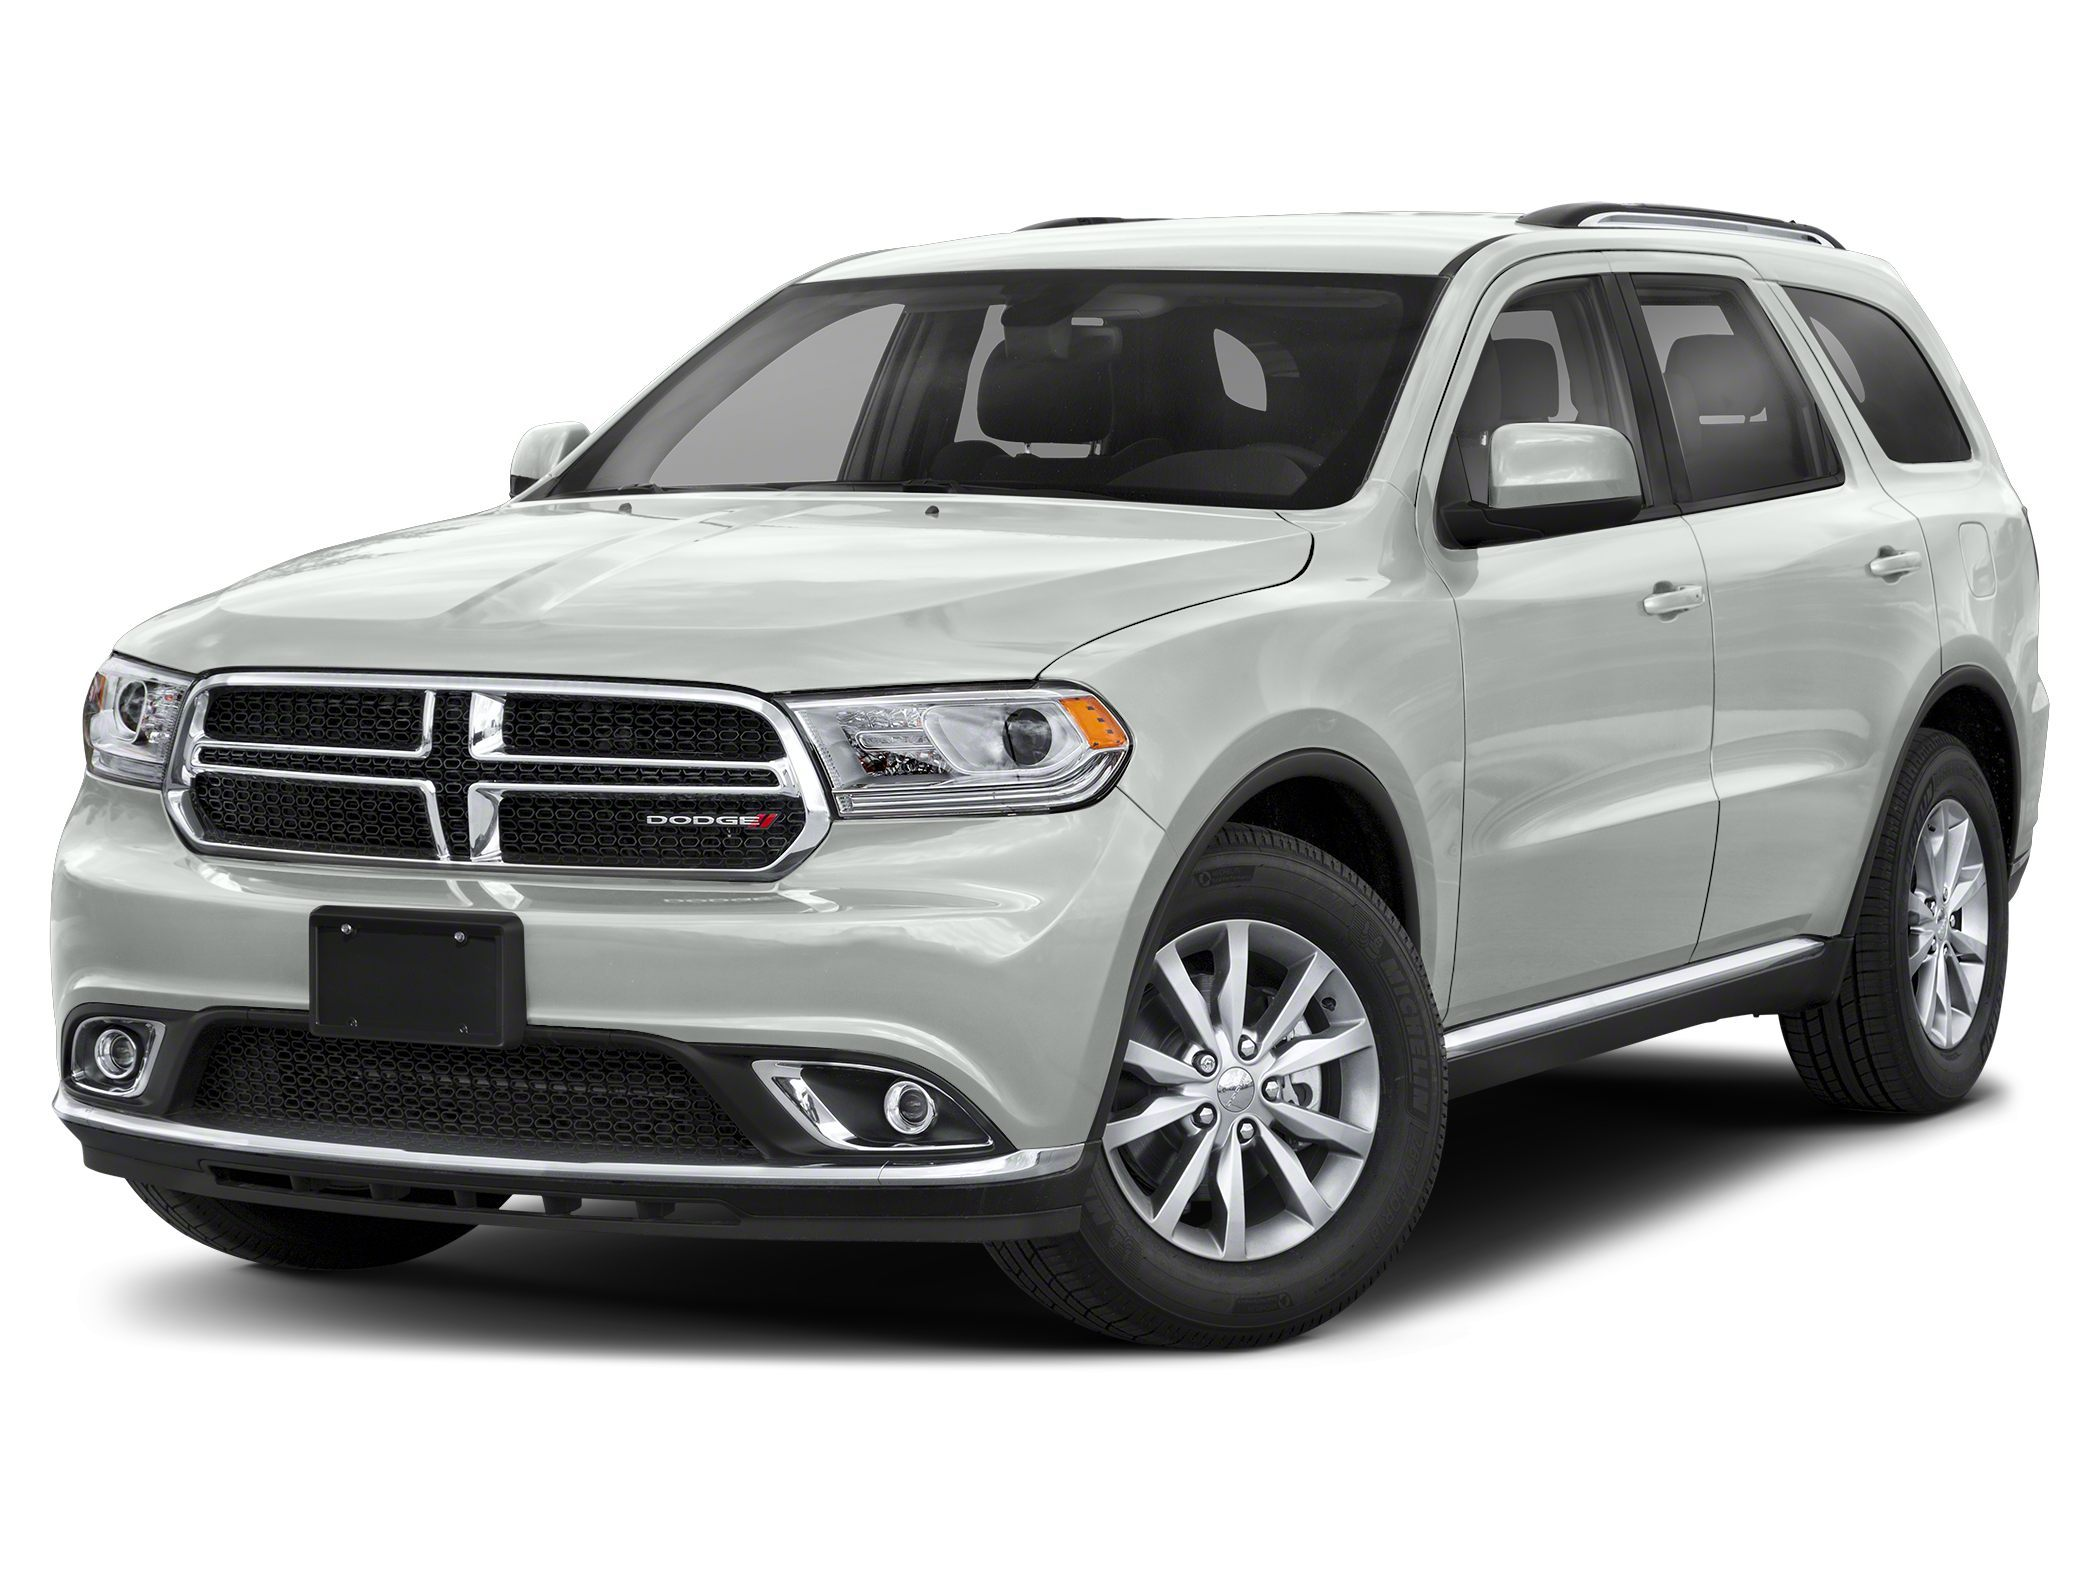 Used 2019 Dodge Durango For Sale San Fernando Ca 1c4rdhdg6kc779407